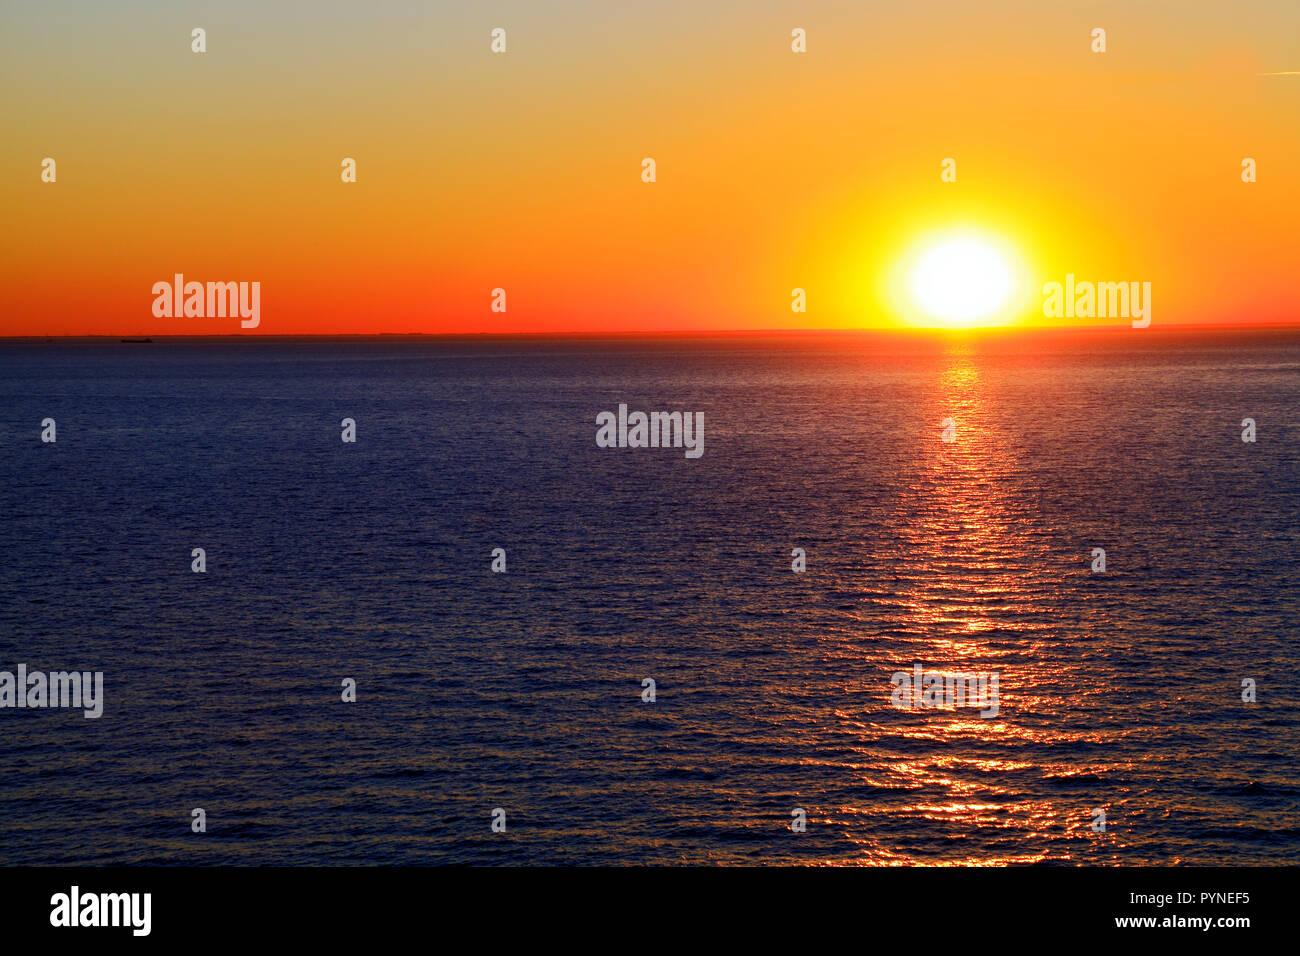 Sunset, sea, red sky, The Wash, North Sea, west facing coast, Hunstanton, Norfolk, UK, coasts - Stock Image